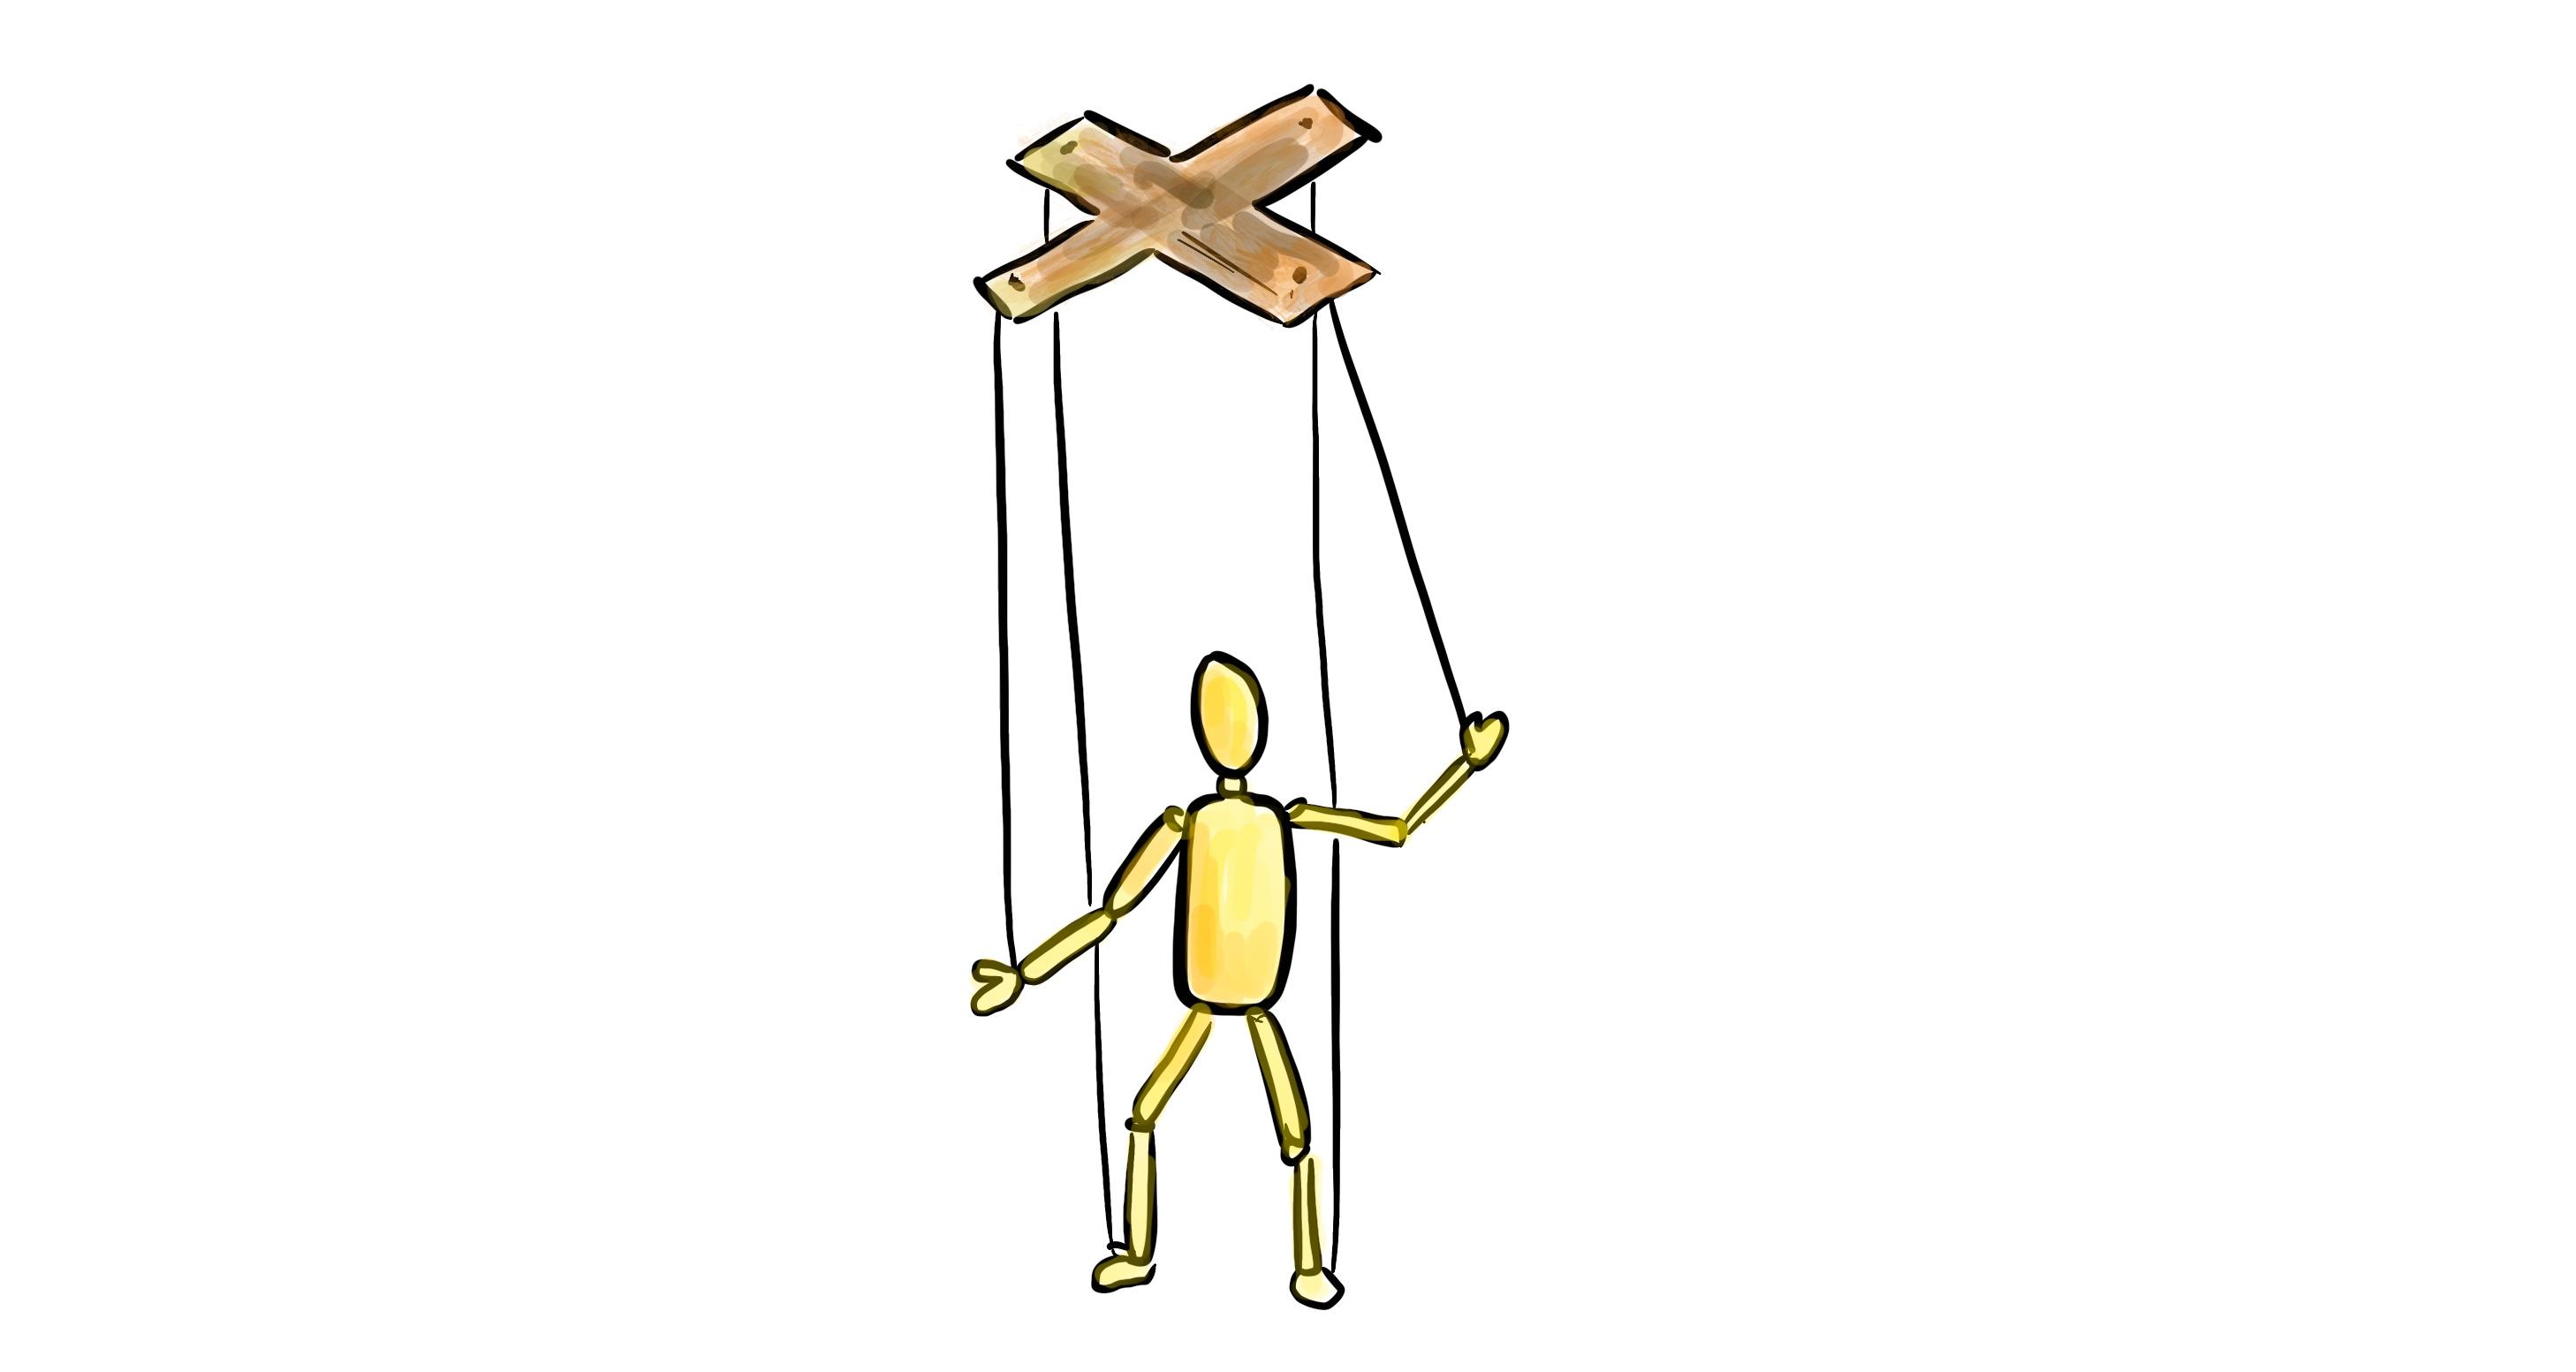 Leadership weakness: Being too controlling